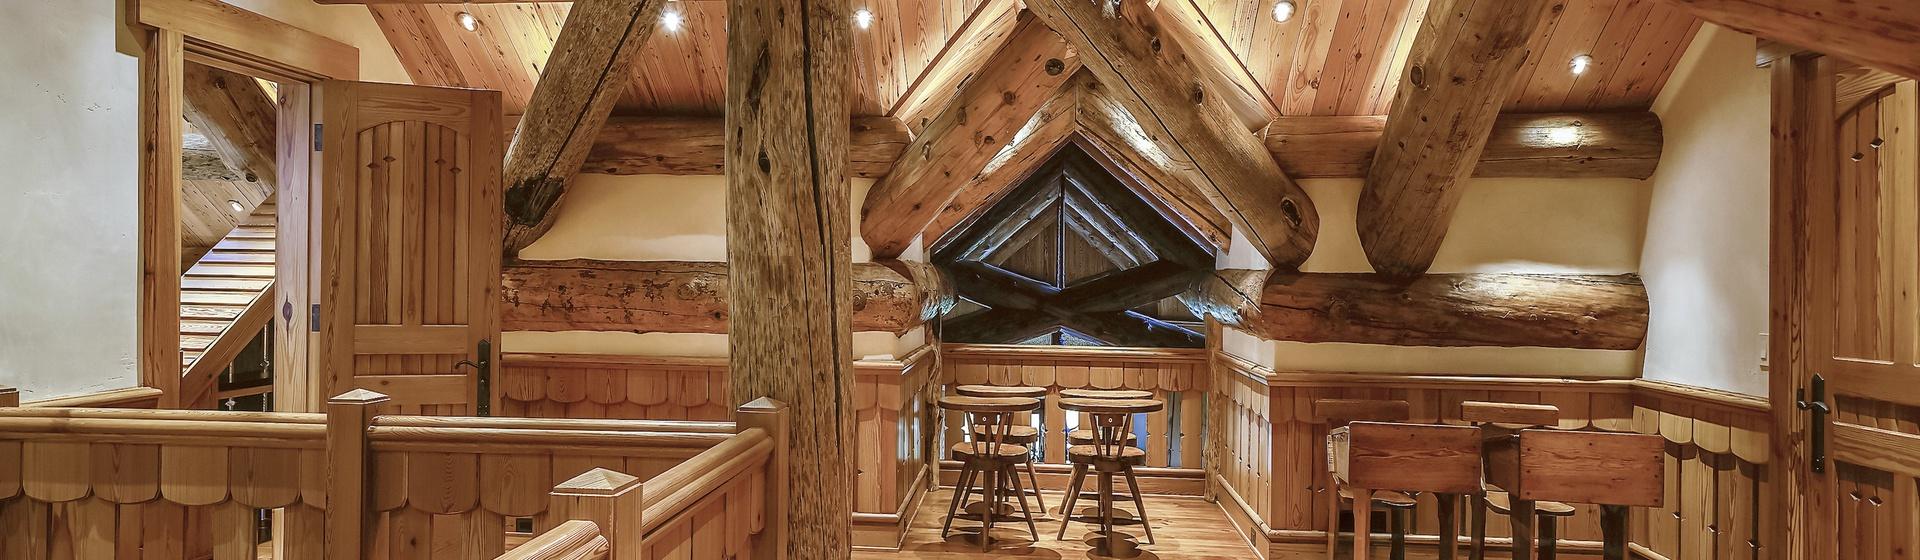 9.13-Telluride-Sleeping-Indian-Ranch-Swiss-Suite-Loft-Sitting-Area-3-web.JPG